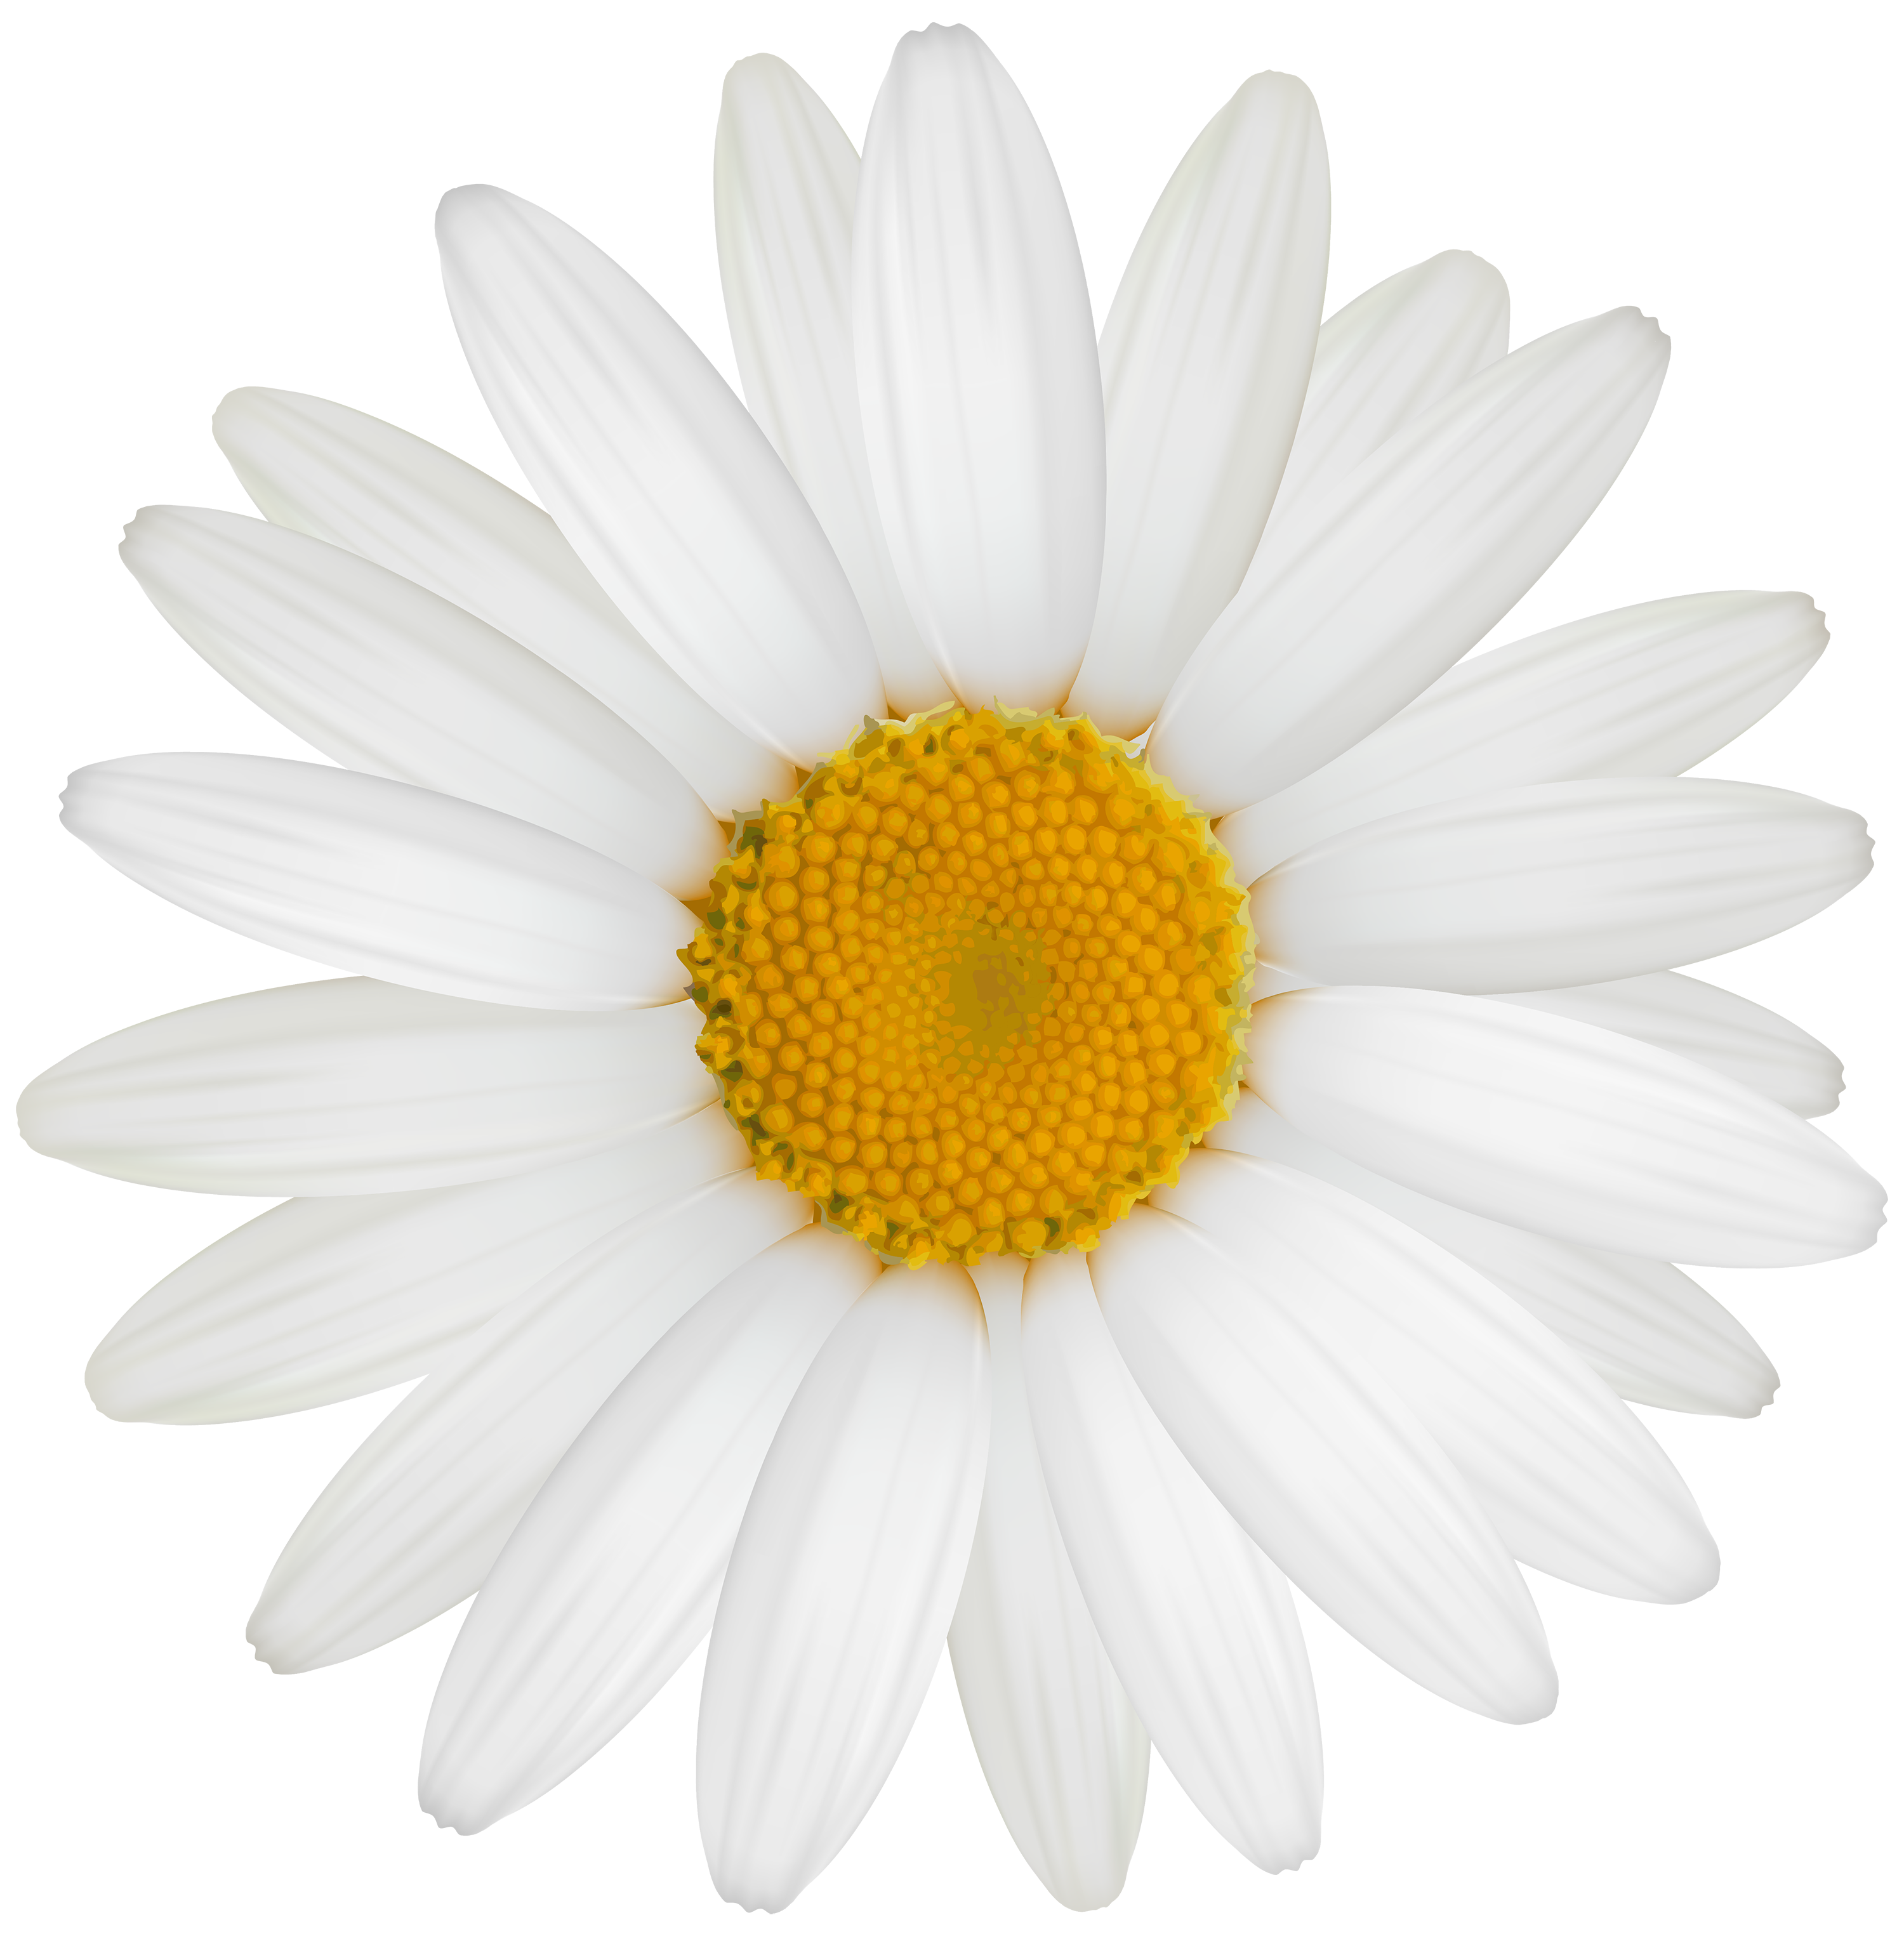 Daisy flower png. White clipart best web